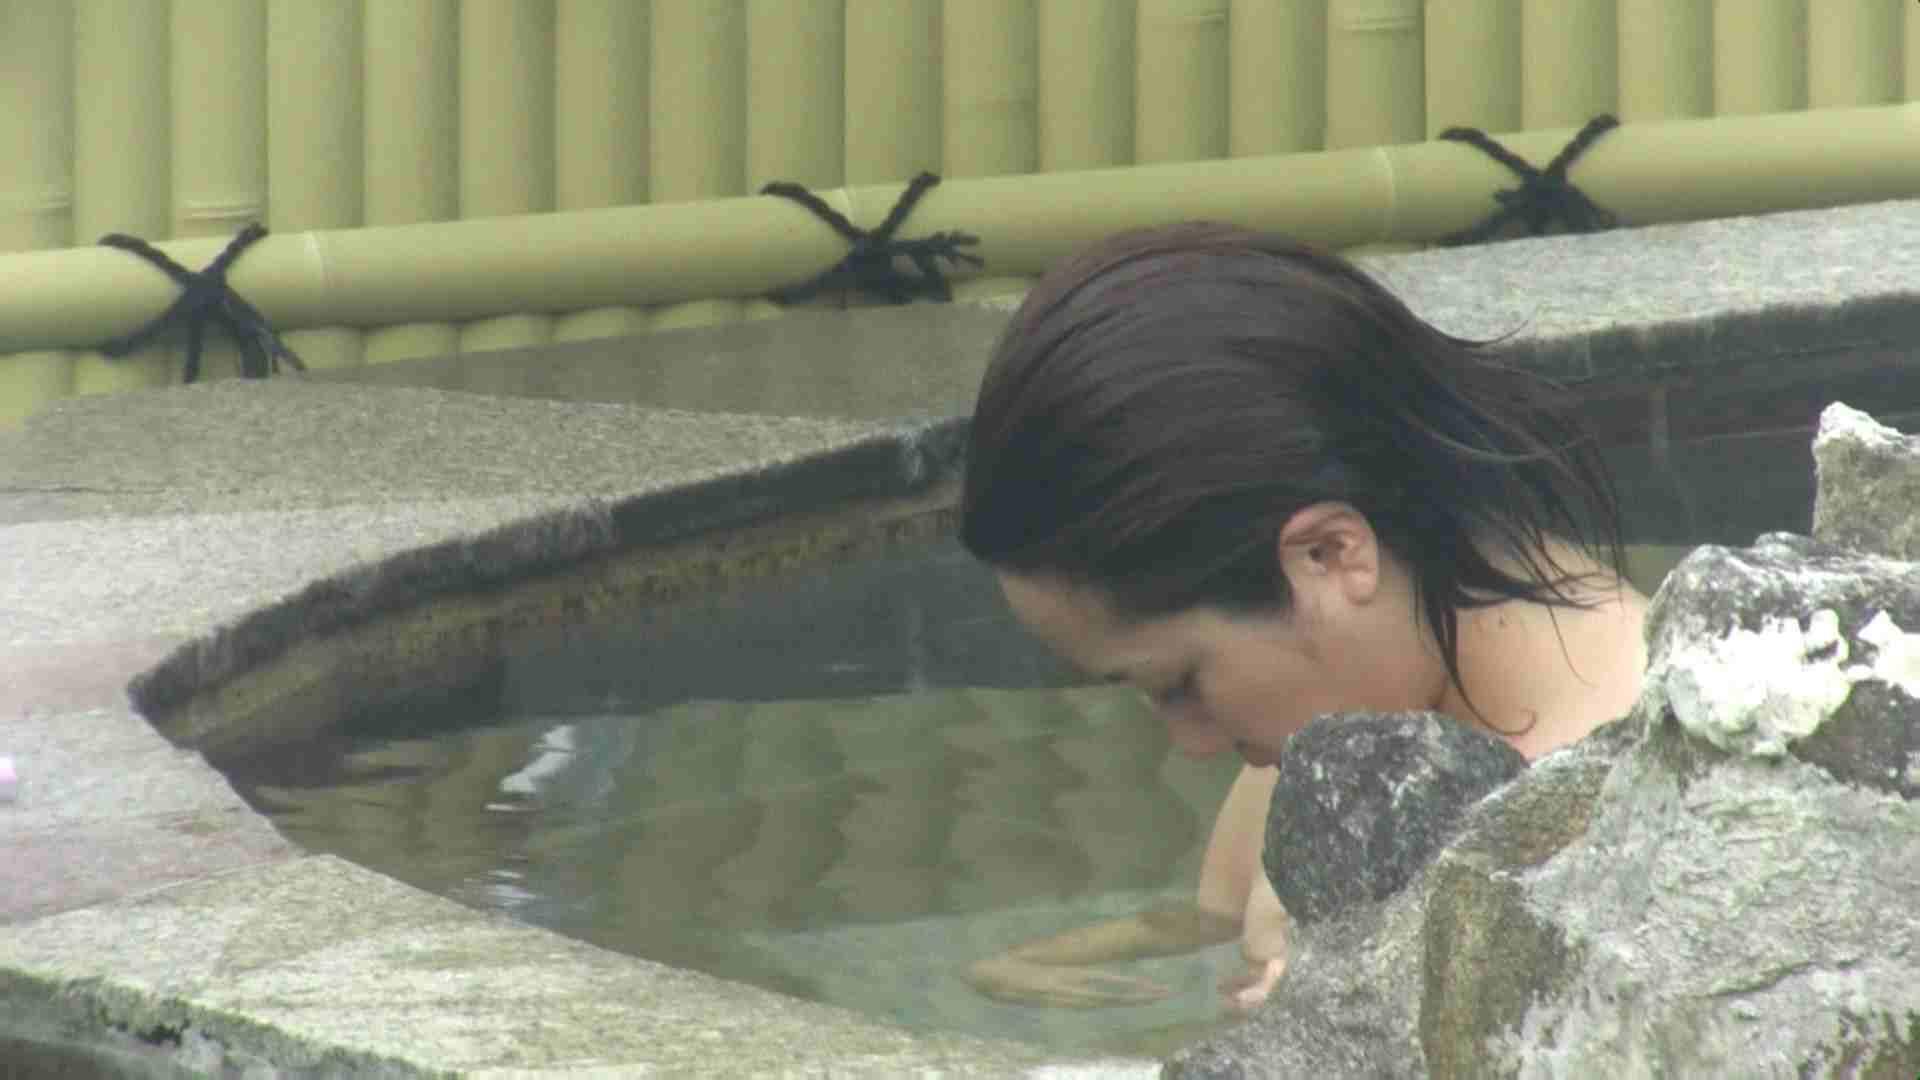 Aquaな露天風呂Vol.604 OLのエロ生活 オメコ動画キャプチャ 84連発 26